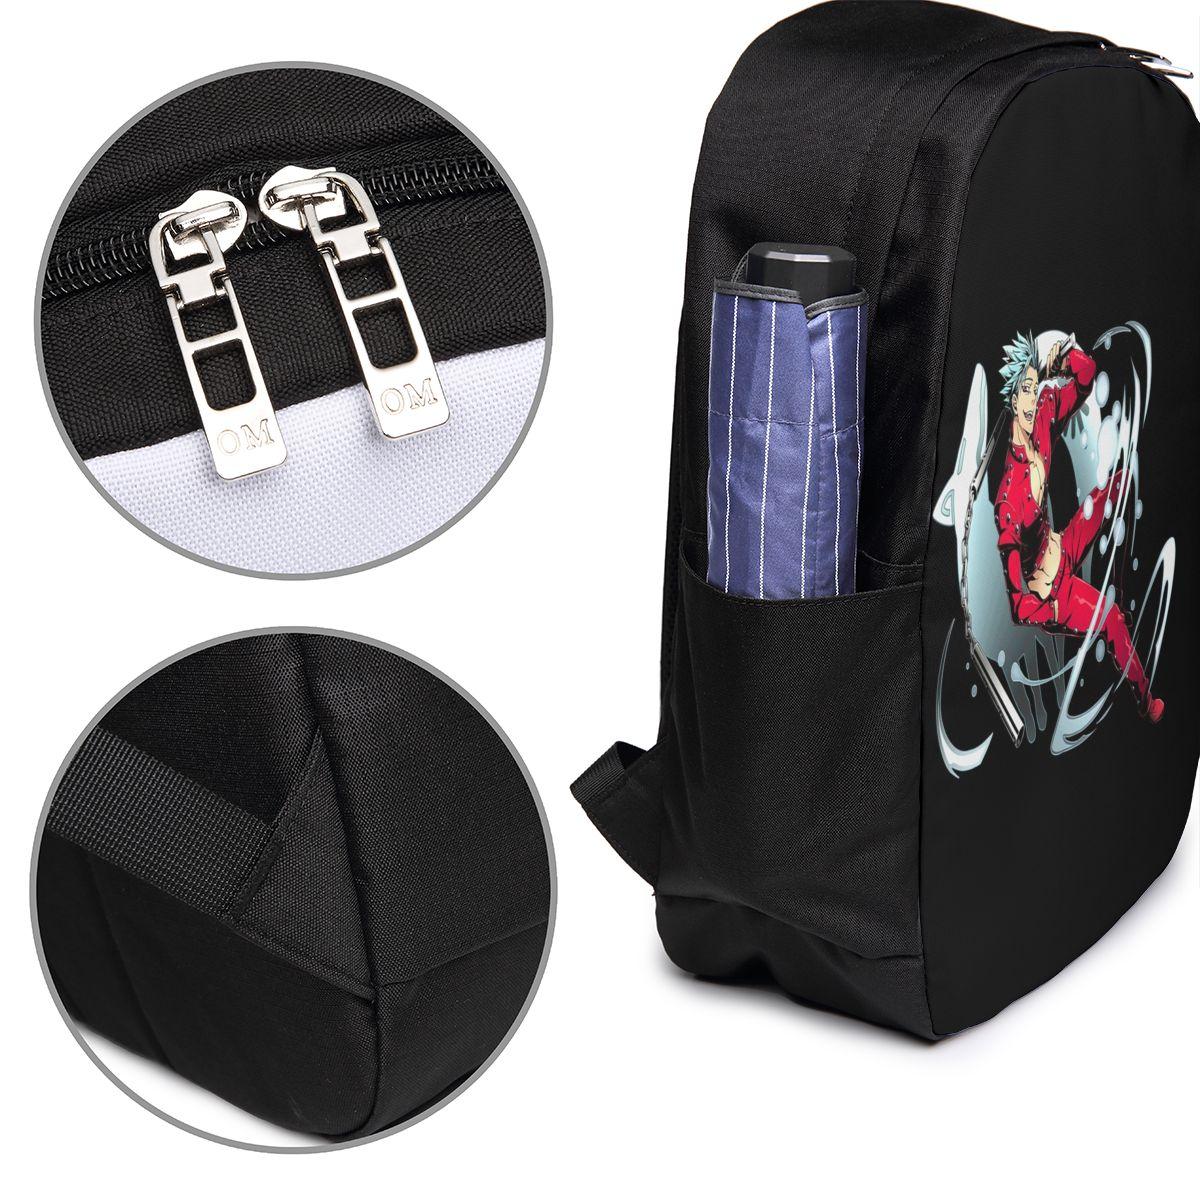 Nanatsu No Taizai The Seven Deadly Sins Backpack Nanatsu No Taizai The Seven Deadly Sins Backpacks Men's Women's Trend Bag Bags